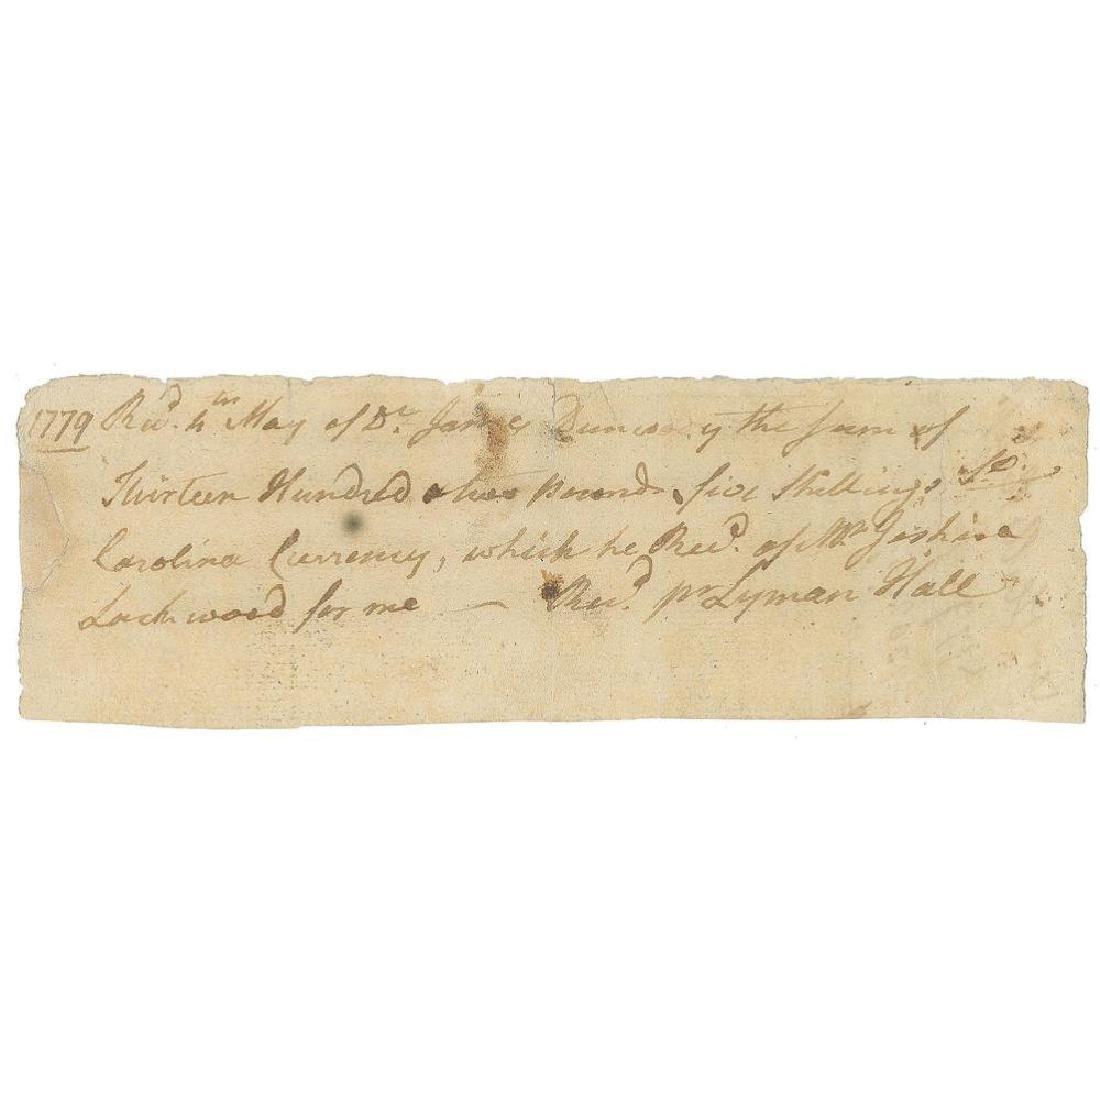 Lyman Hall, Rare Declaration Signer, Rev War-Dated ADS